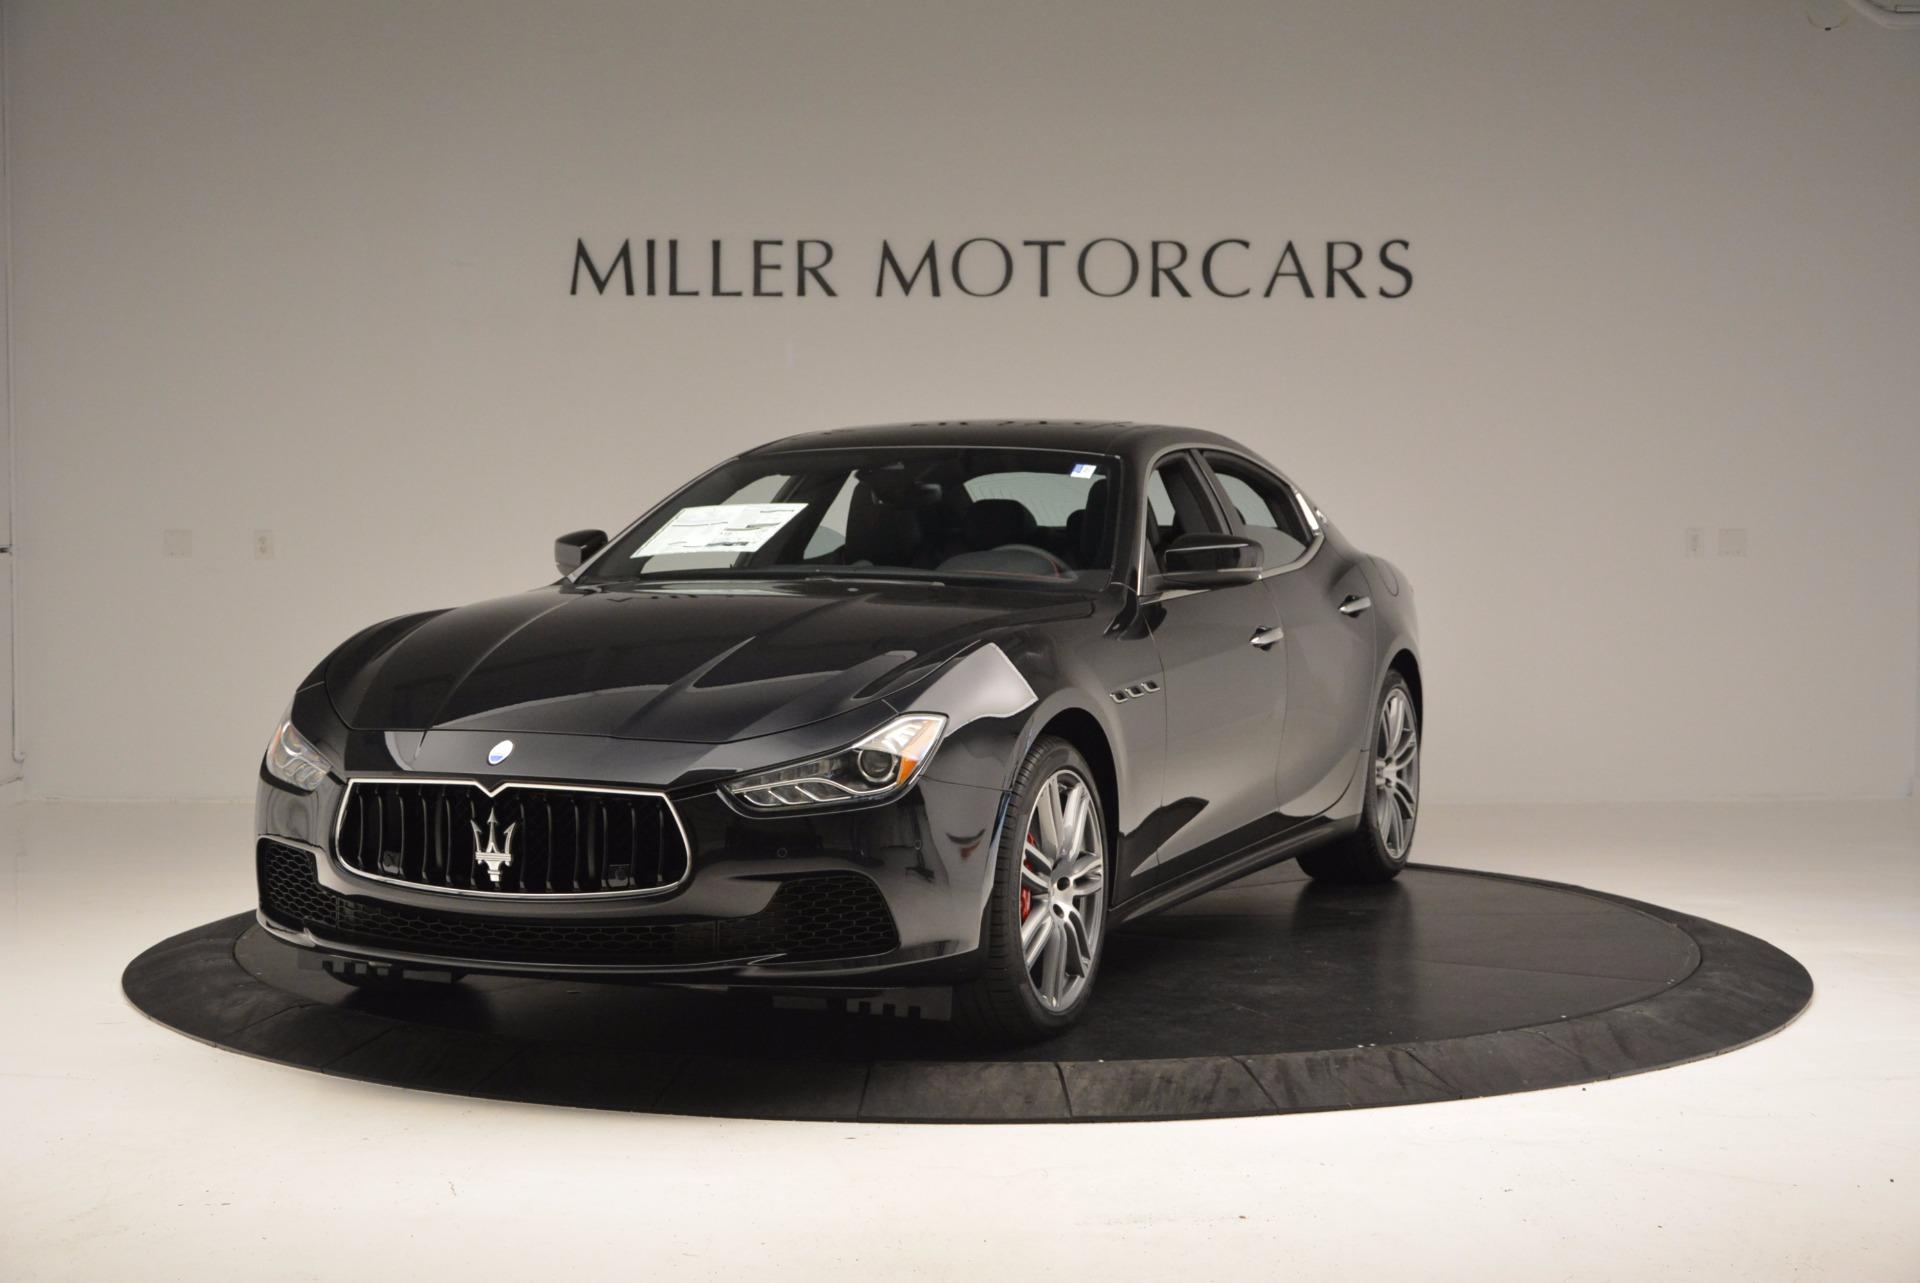 New 2017 Maserati Ghibli S Q4 For Sale In Greenwich, CT 1022_main